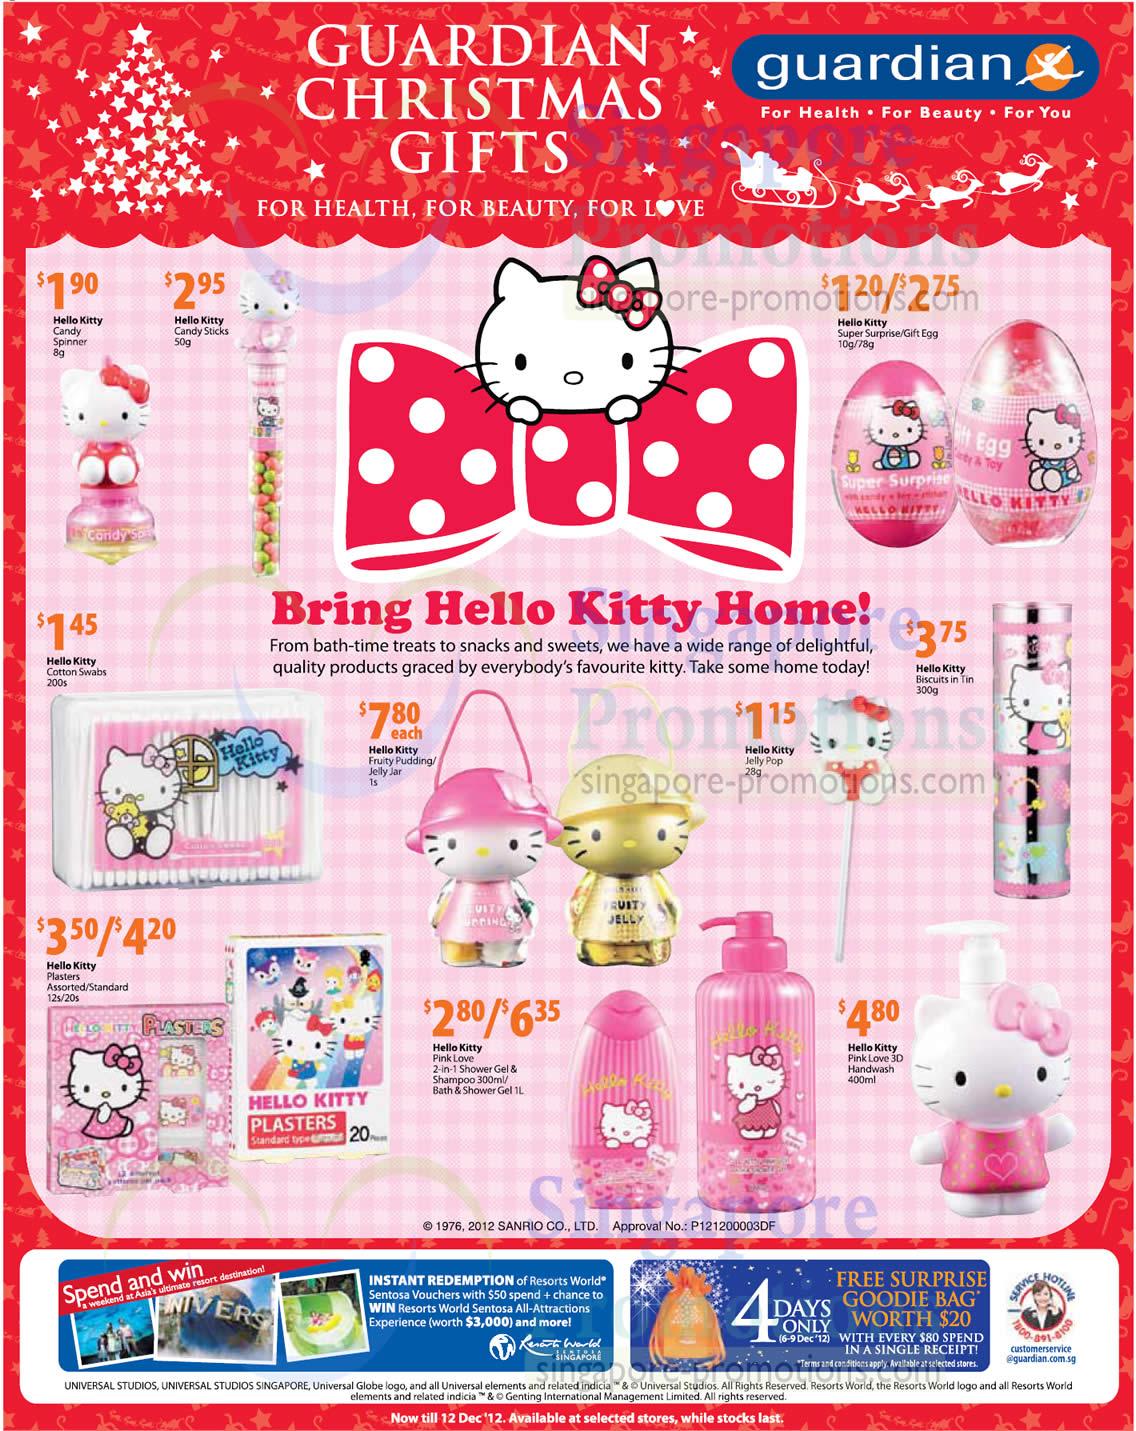 Hello Kitty Fruity Pudding, Hello Kitty Jelly Jar, Hello Kitty Bath and Shower Gel